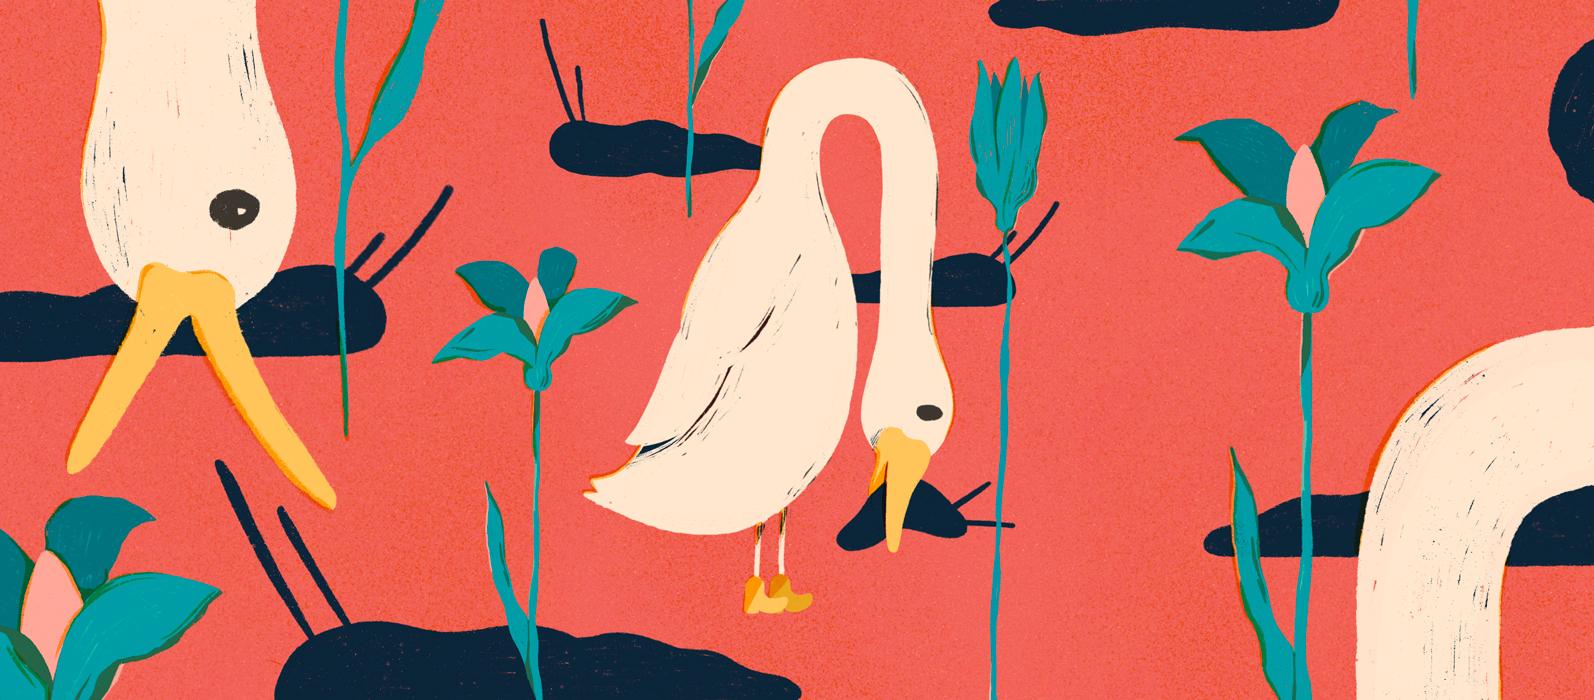 duck eating killer slug illustration